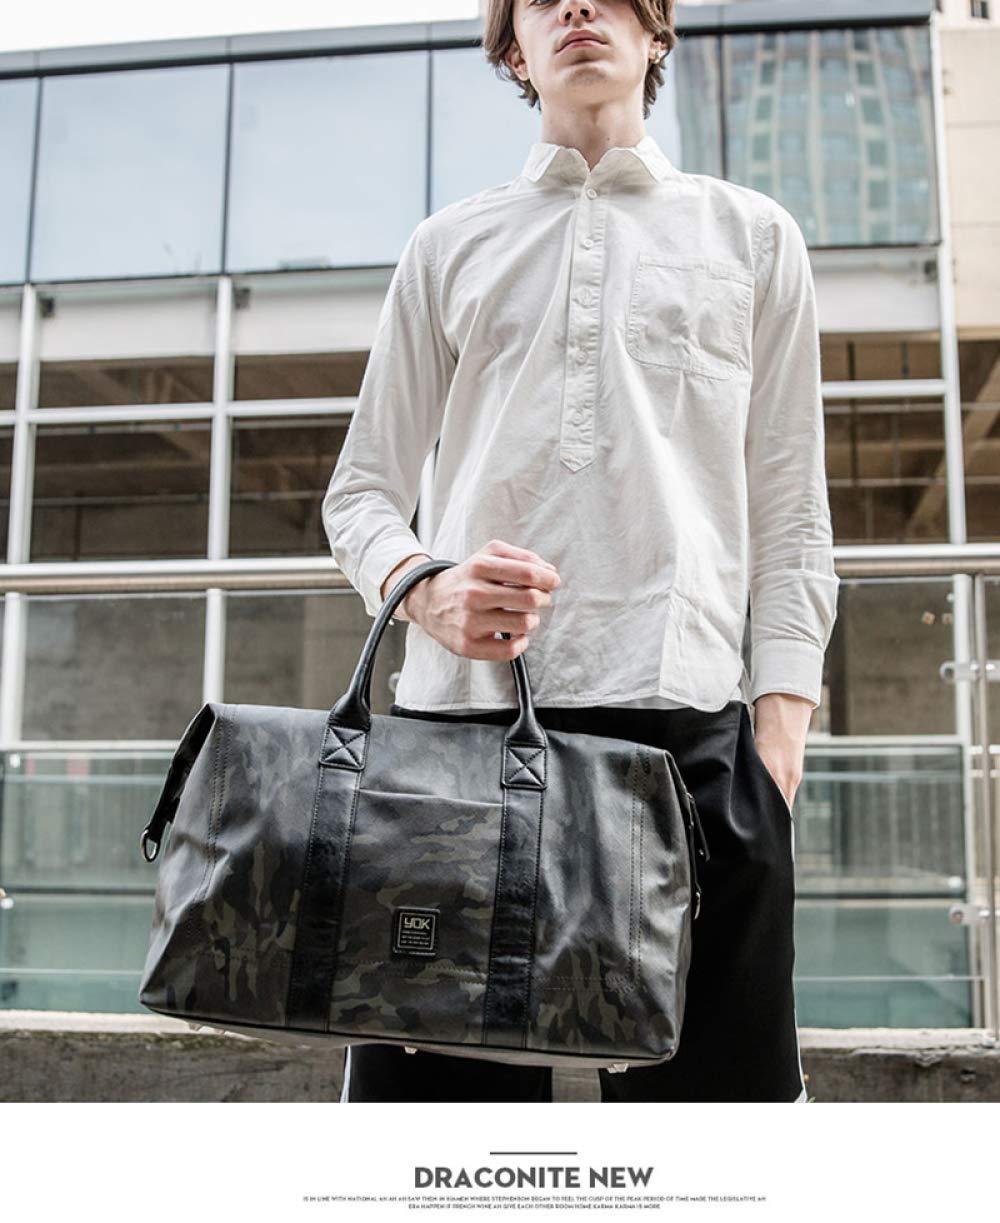 LAIDAYE Quality Baggage Travel Bag Handbag Leather Luggage Bag Waterproof Large Capacity Light Luggage Storage Bag Weekend Fitness Sports Bag Upgrade